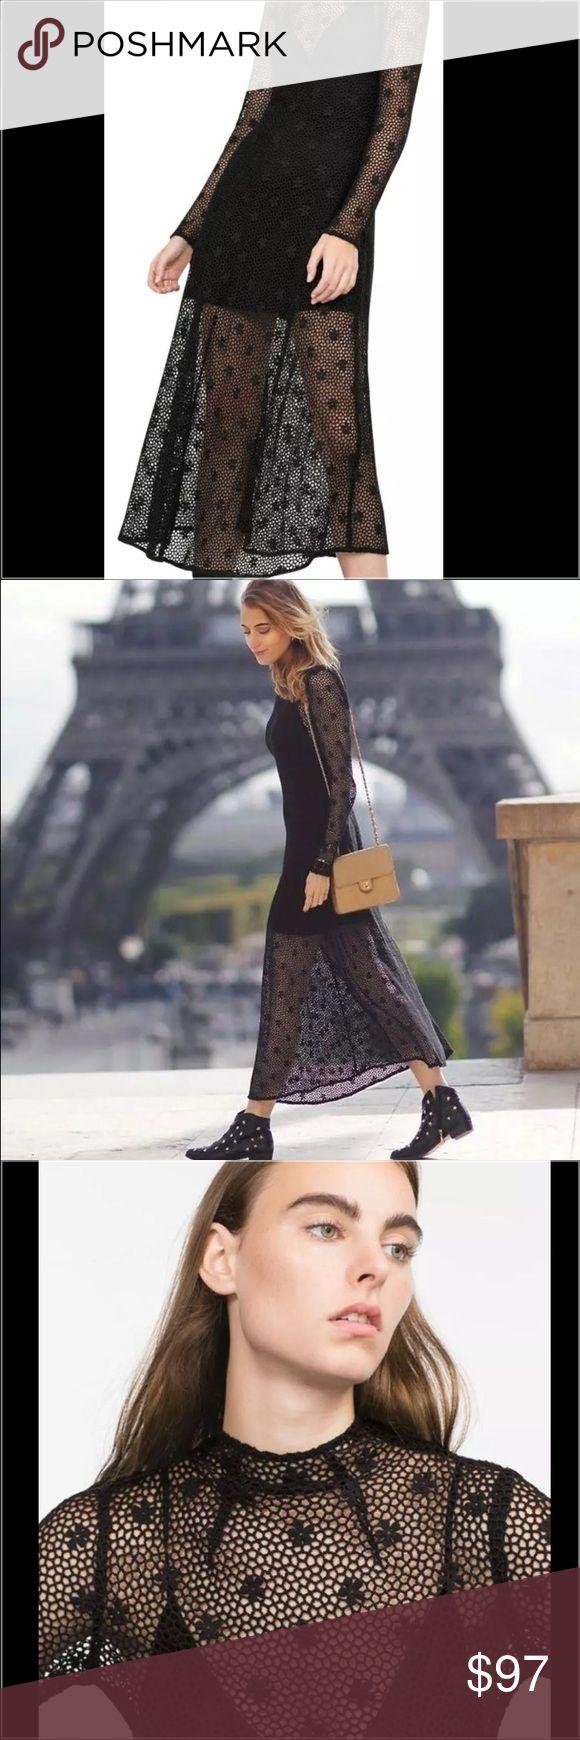 Zara Black Crochet Long Dress XS ZARA  LONG CROCHET DRESS ( comes with under slip)  SOLD OUT BLOGGERS FAVORITE  Color: Black  Size: XS Zara Dresses Maxi